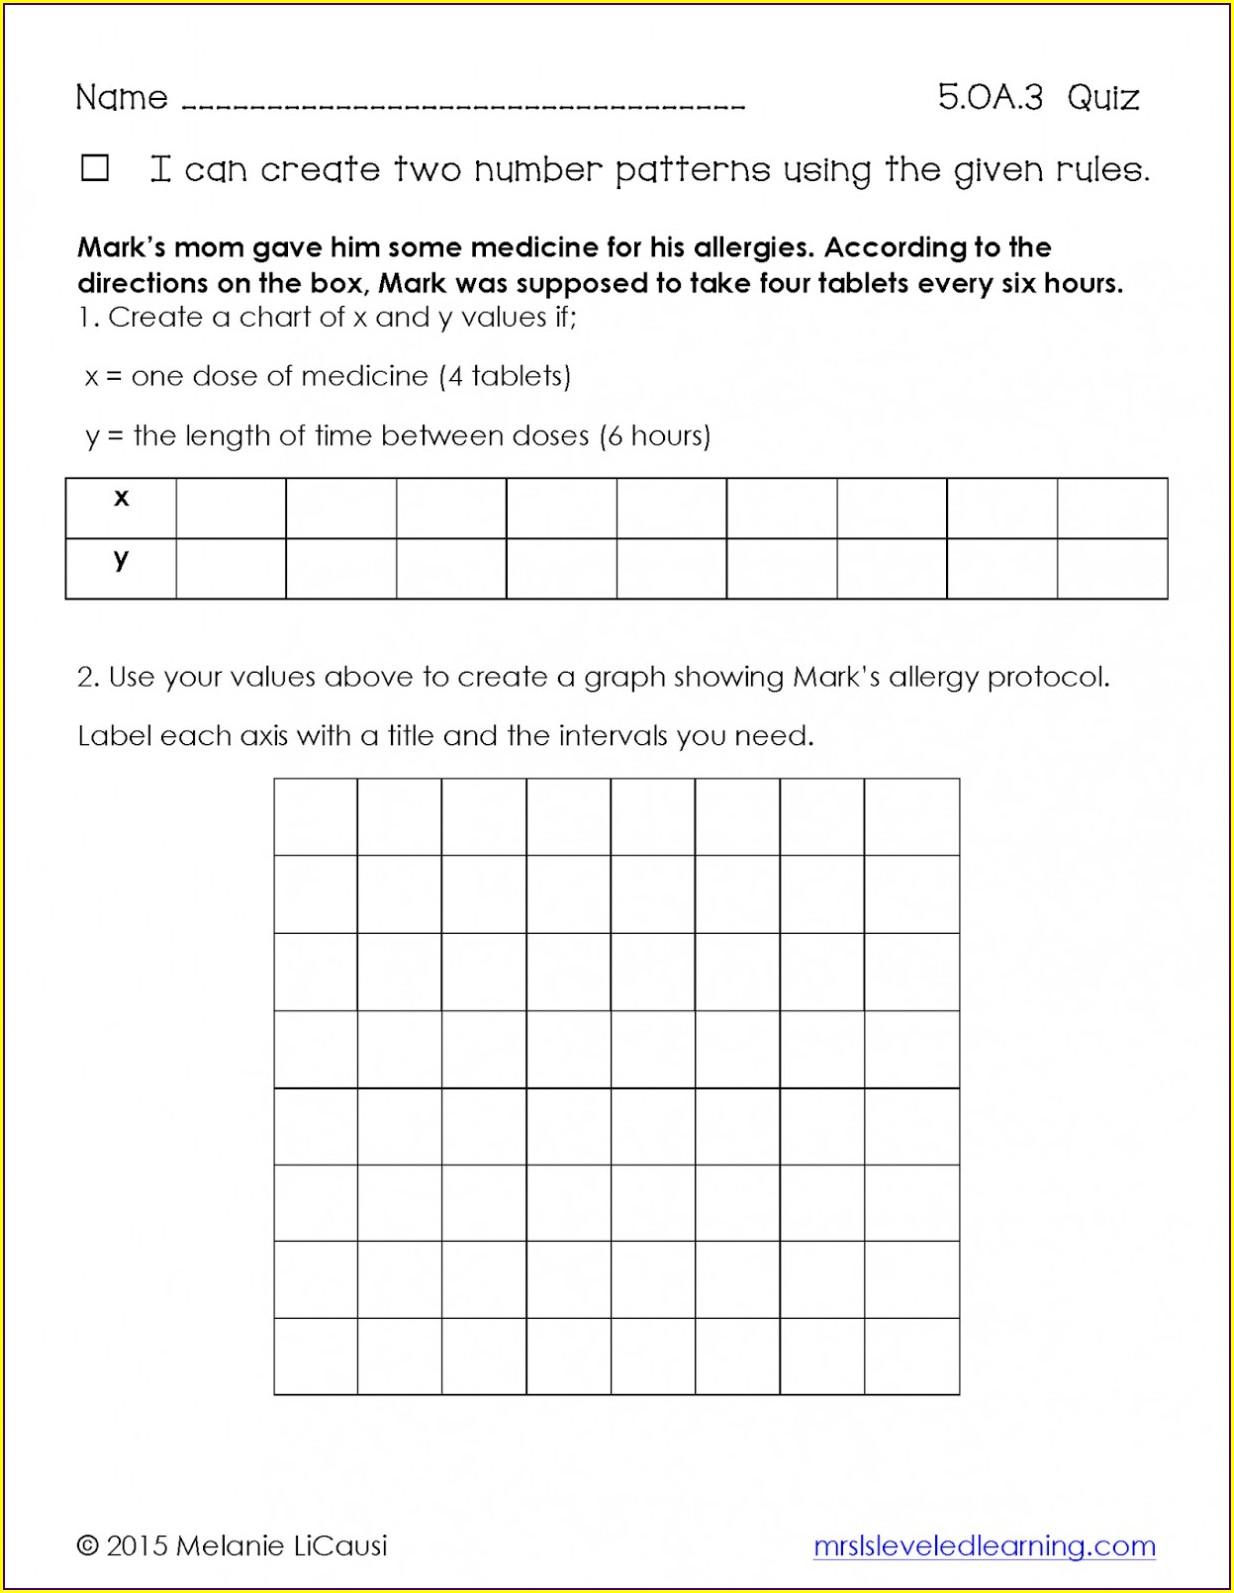 5th Grade Math Order Of Operations Worksheet